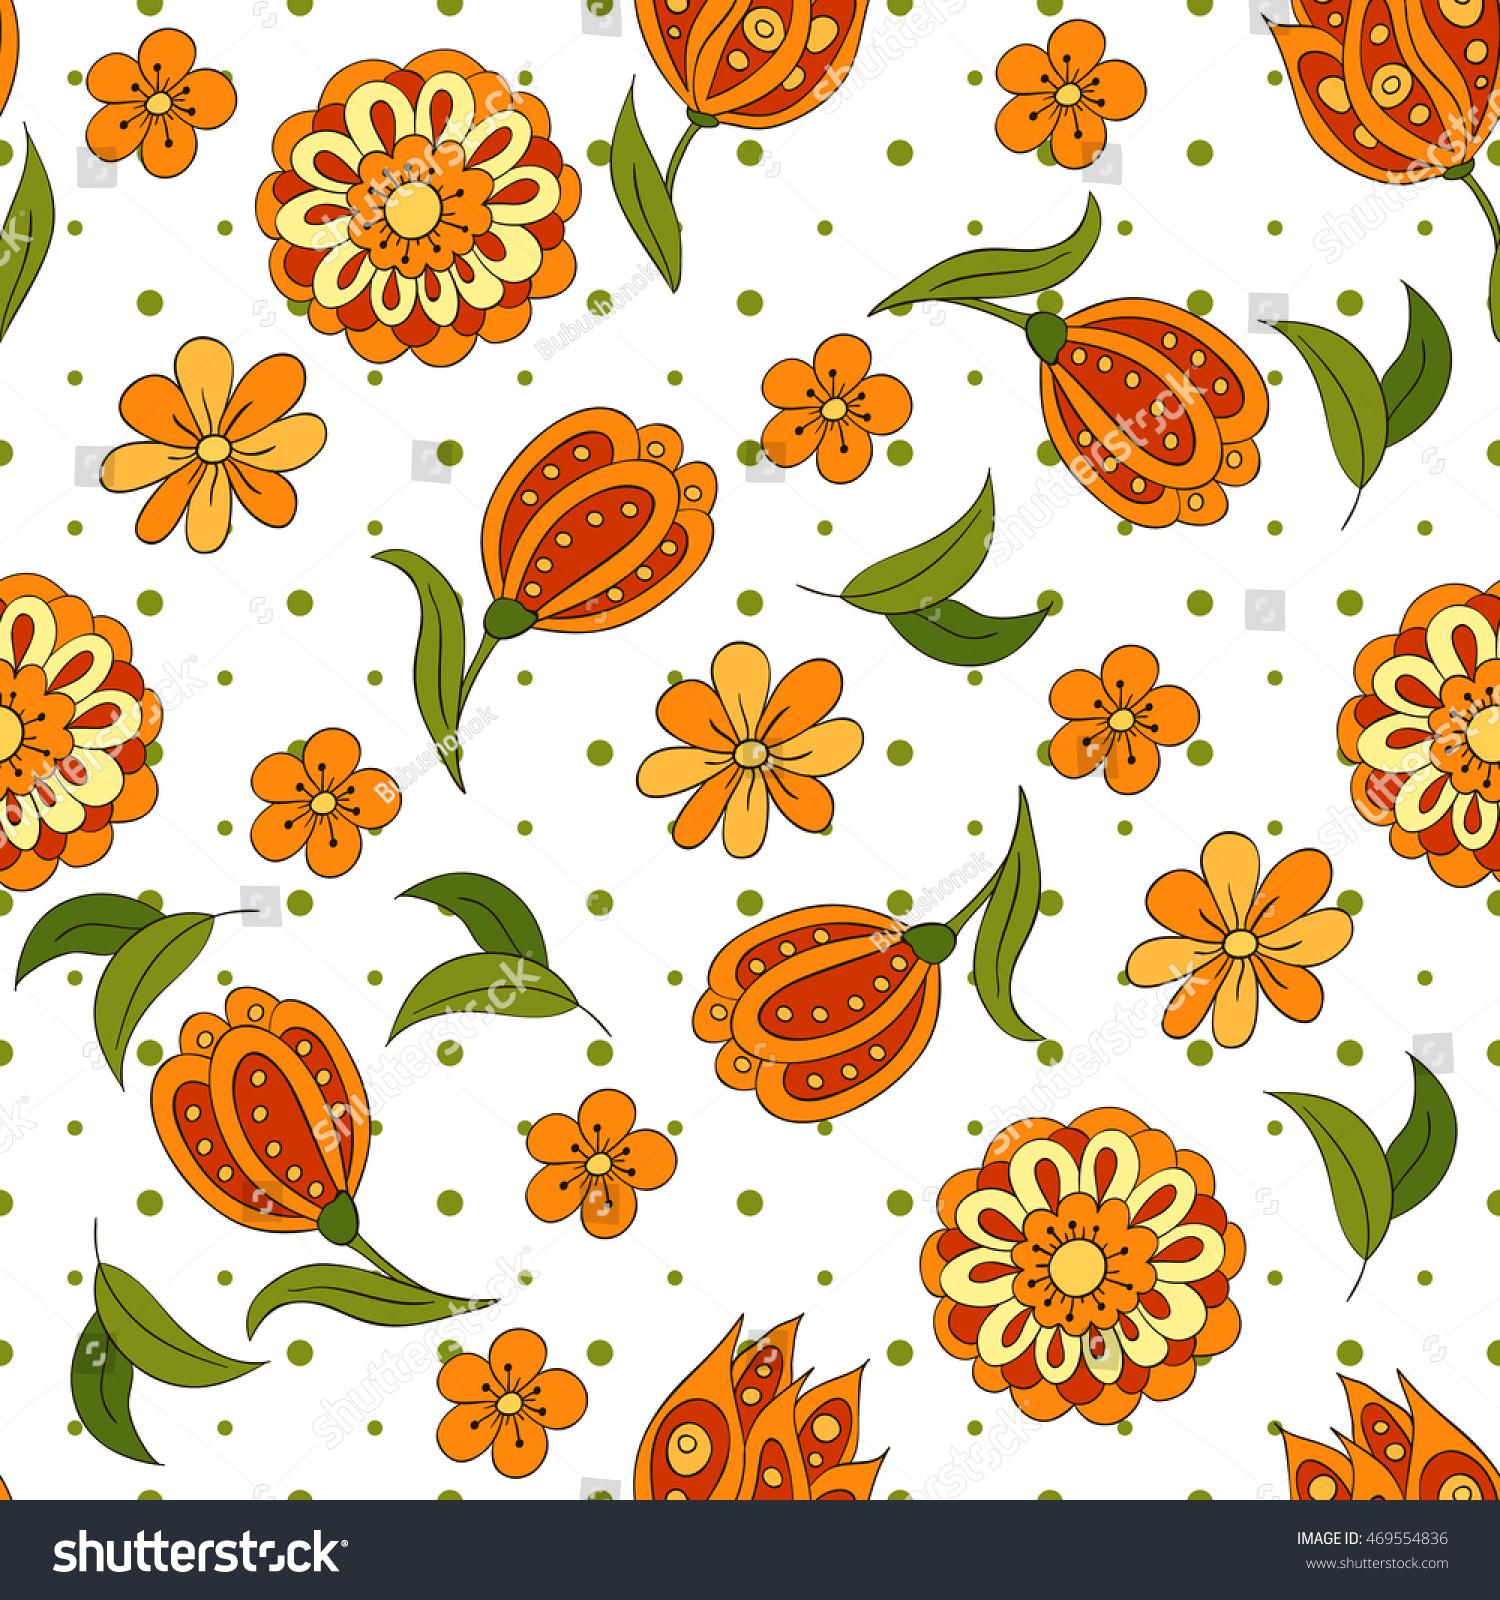 Seamless pattern spring flowers cover background stock vector 2018 seamless pattern with spring flowers cover background orange and green colors spots mightylinksfo